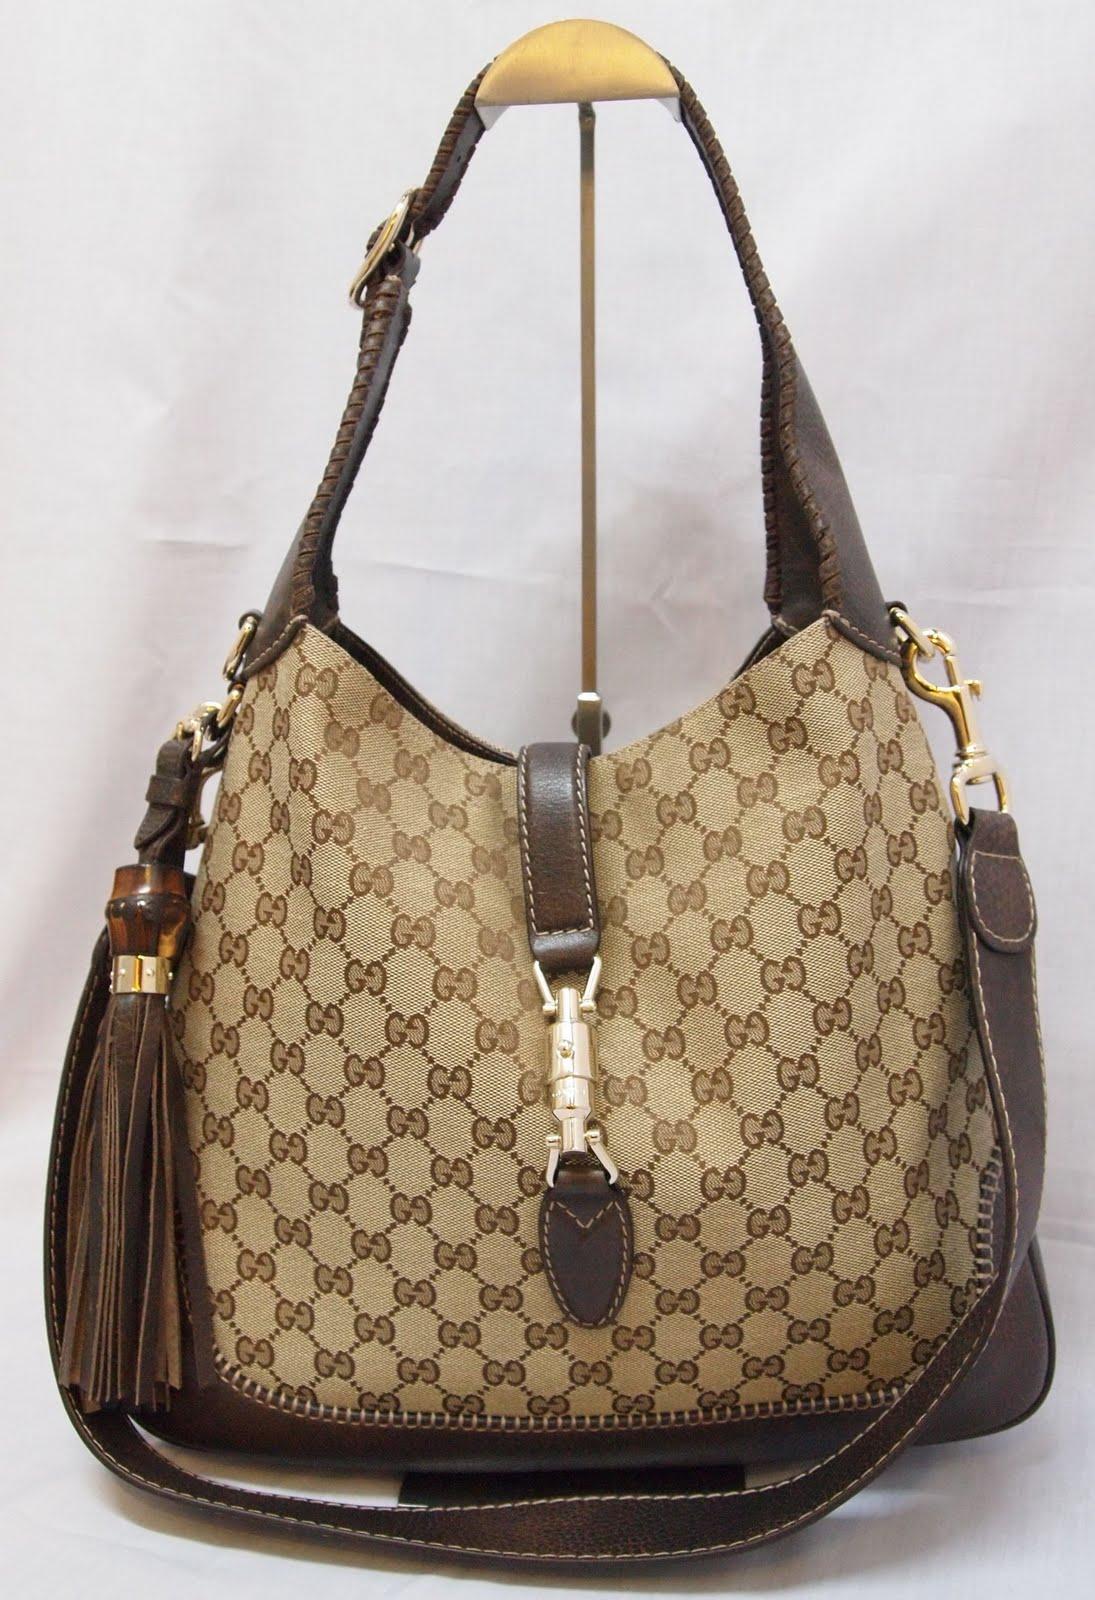 thedeborahshop the new jackie o bag